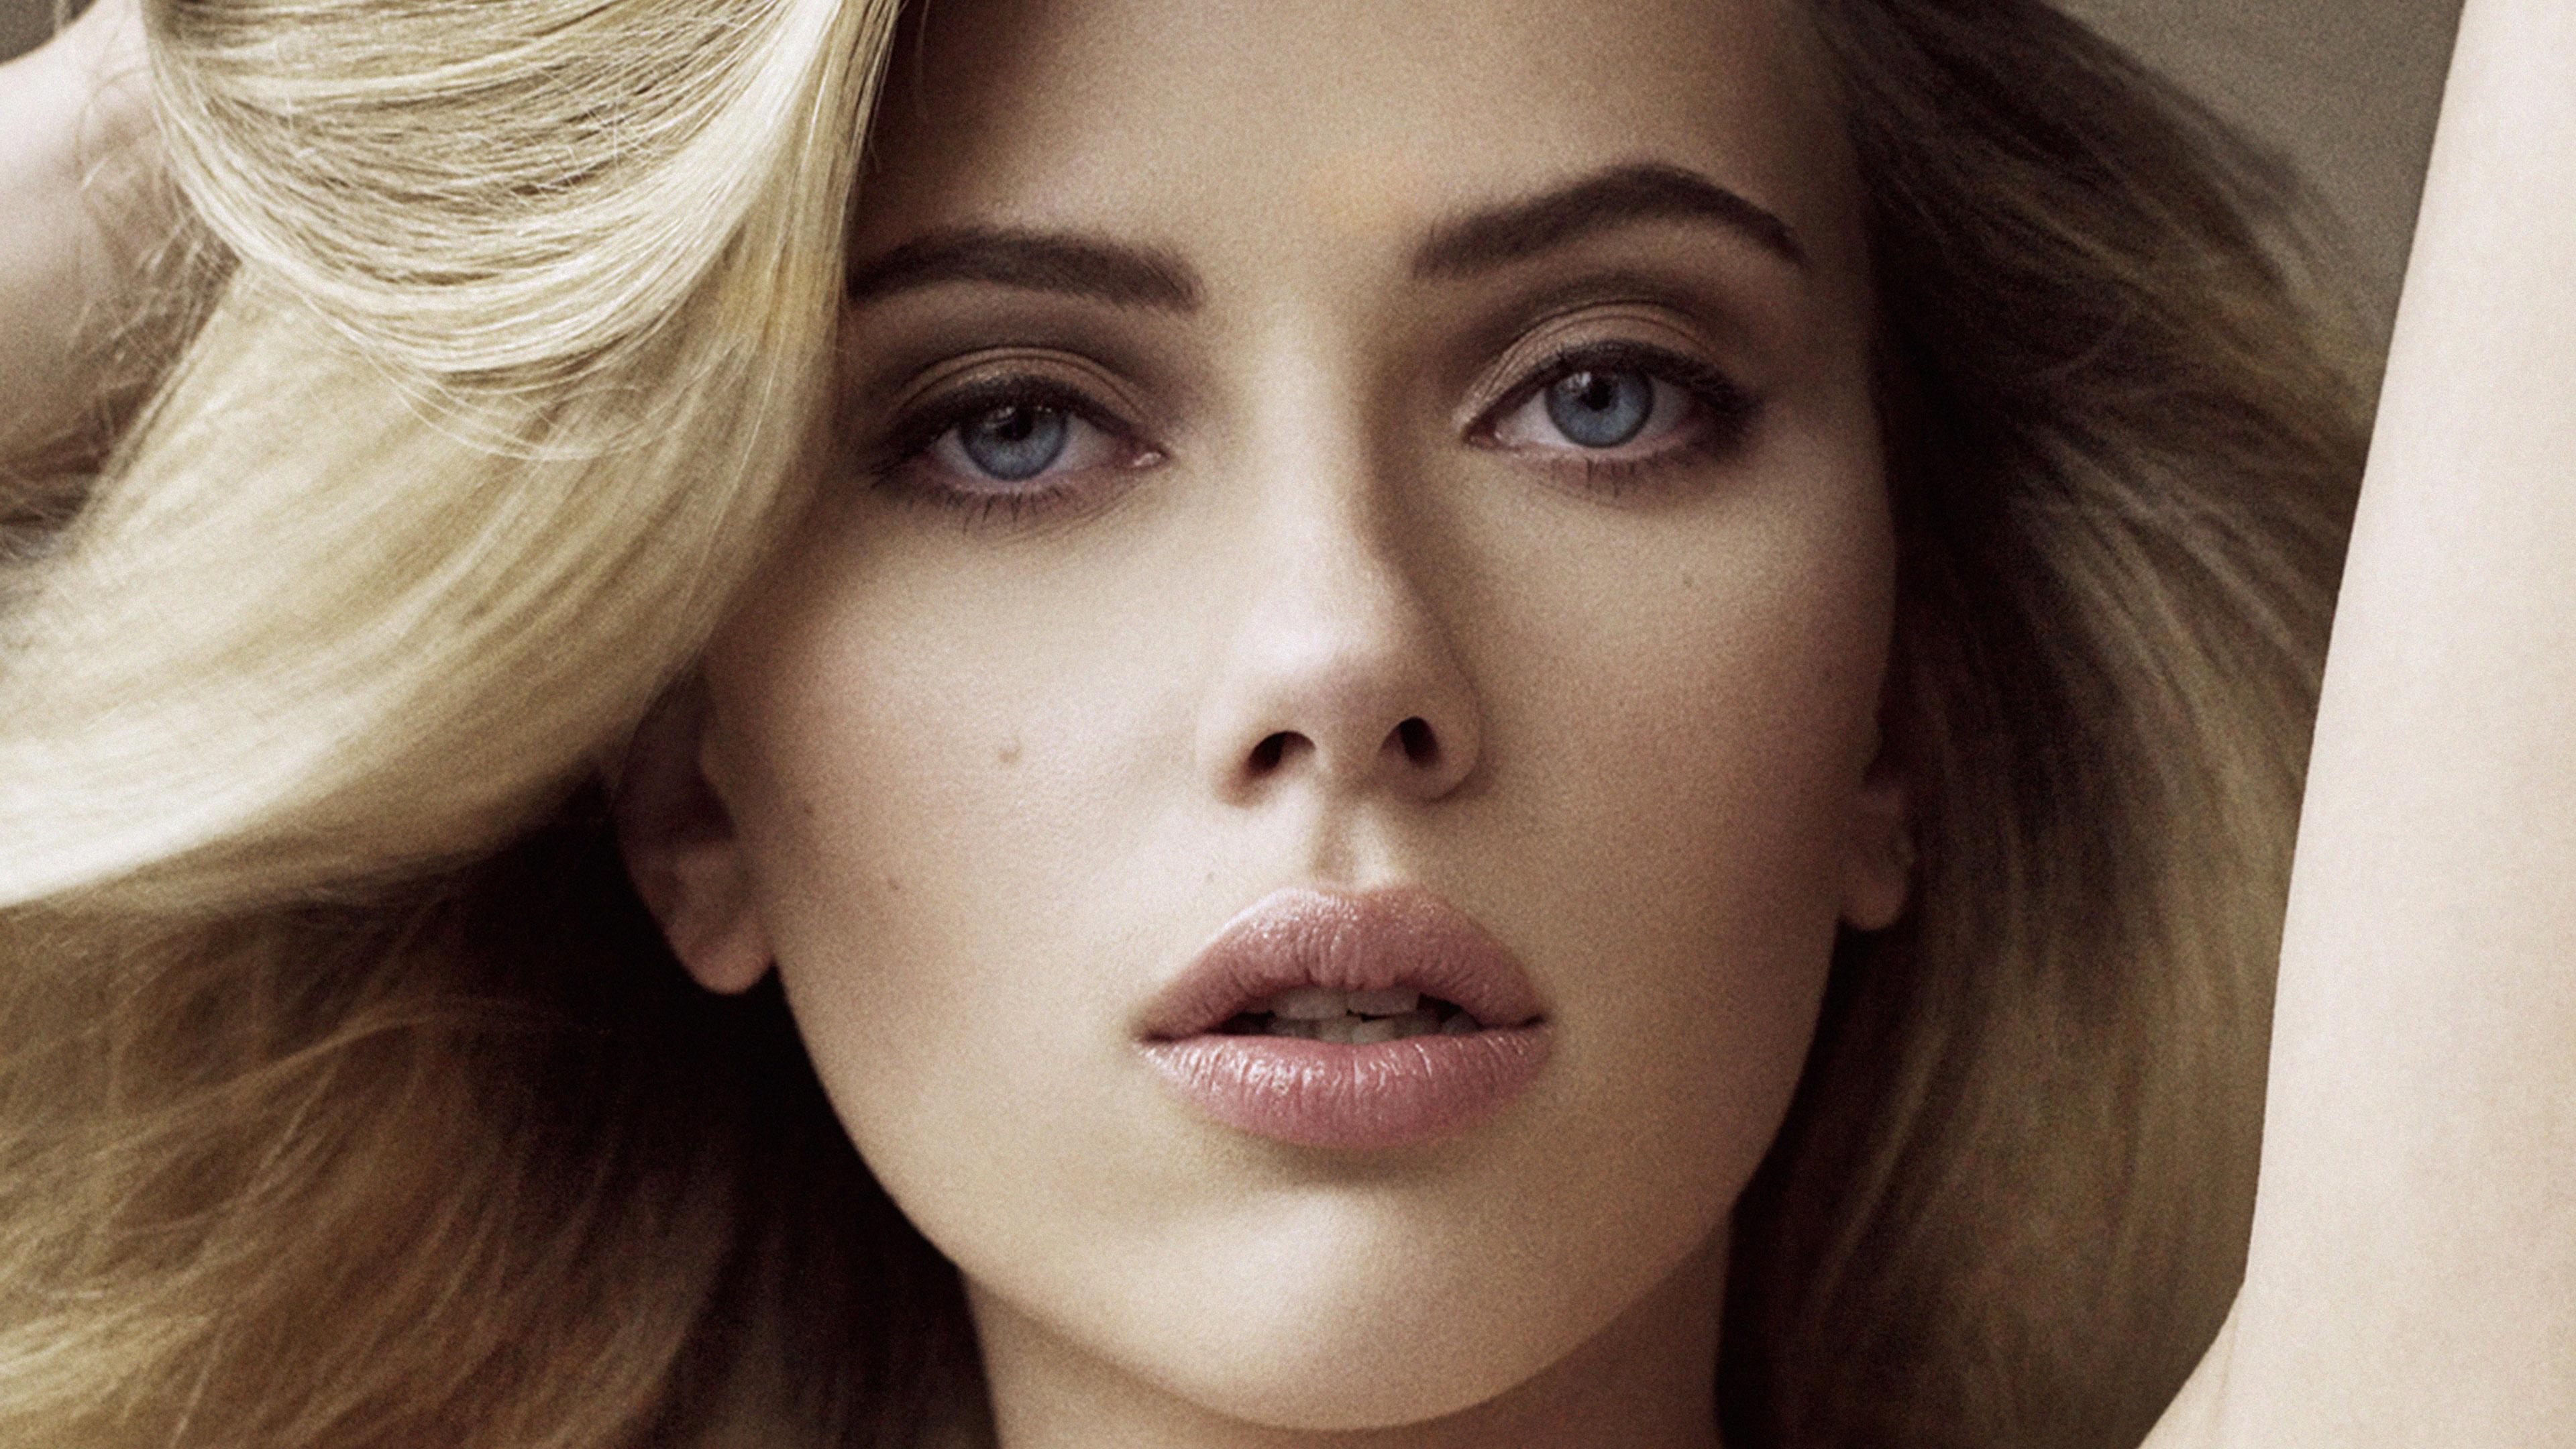 Hc56 Scarlett Johansson Sexy Celebrity Papers Co